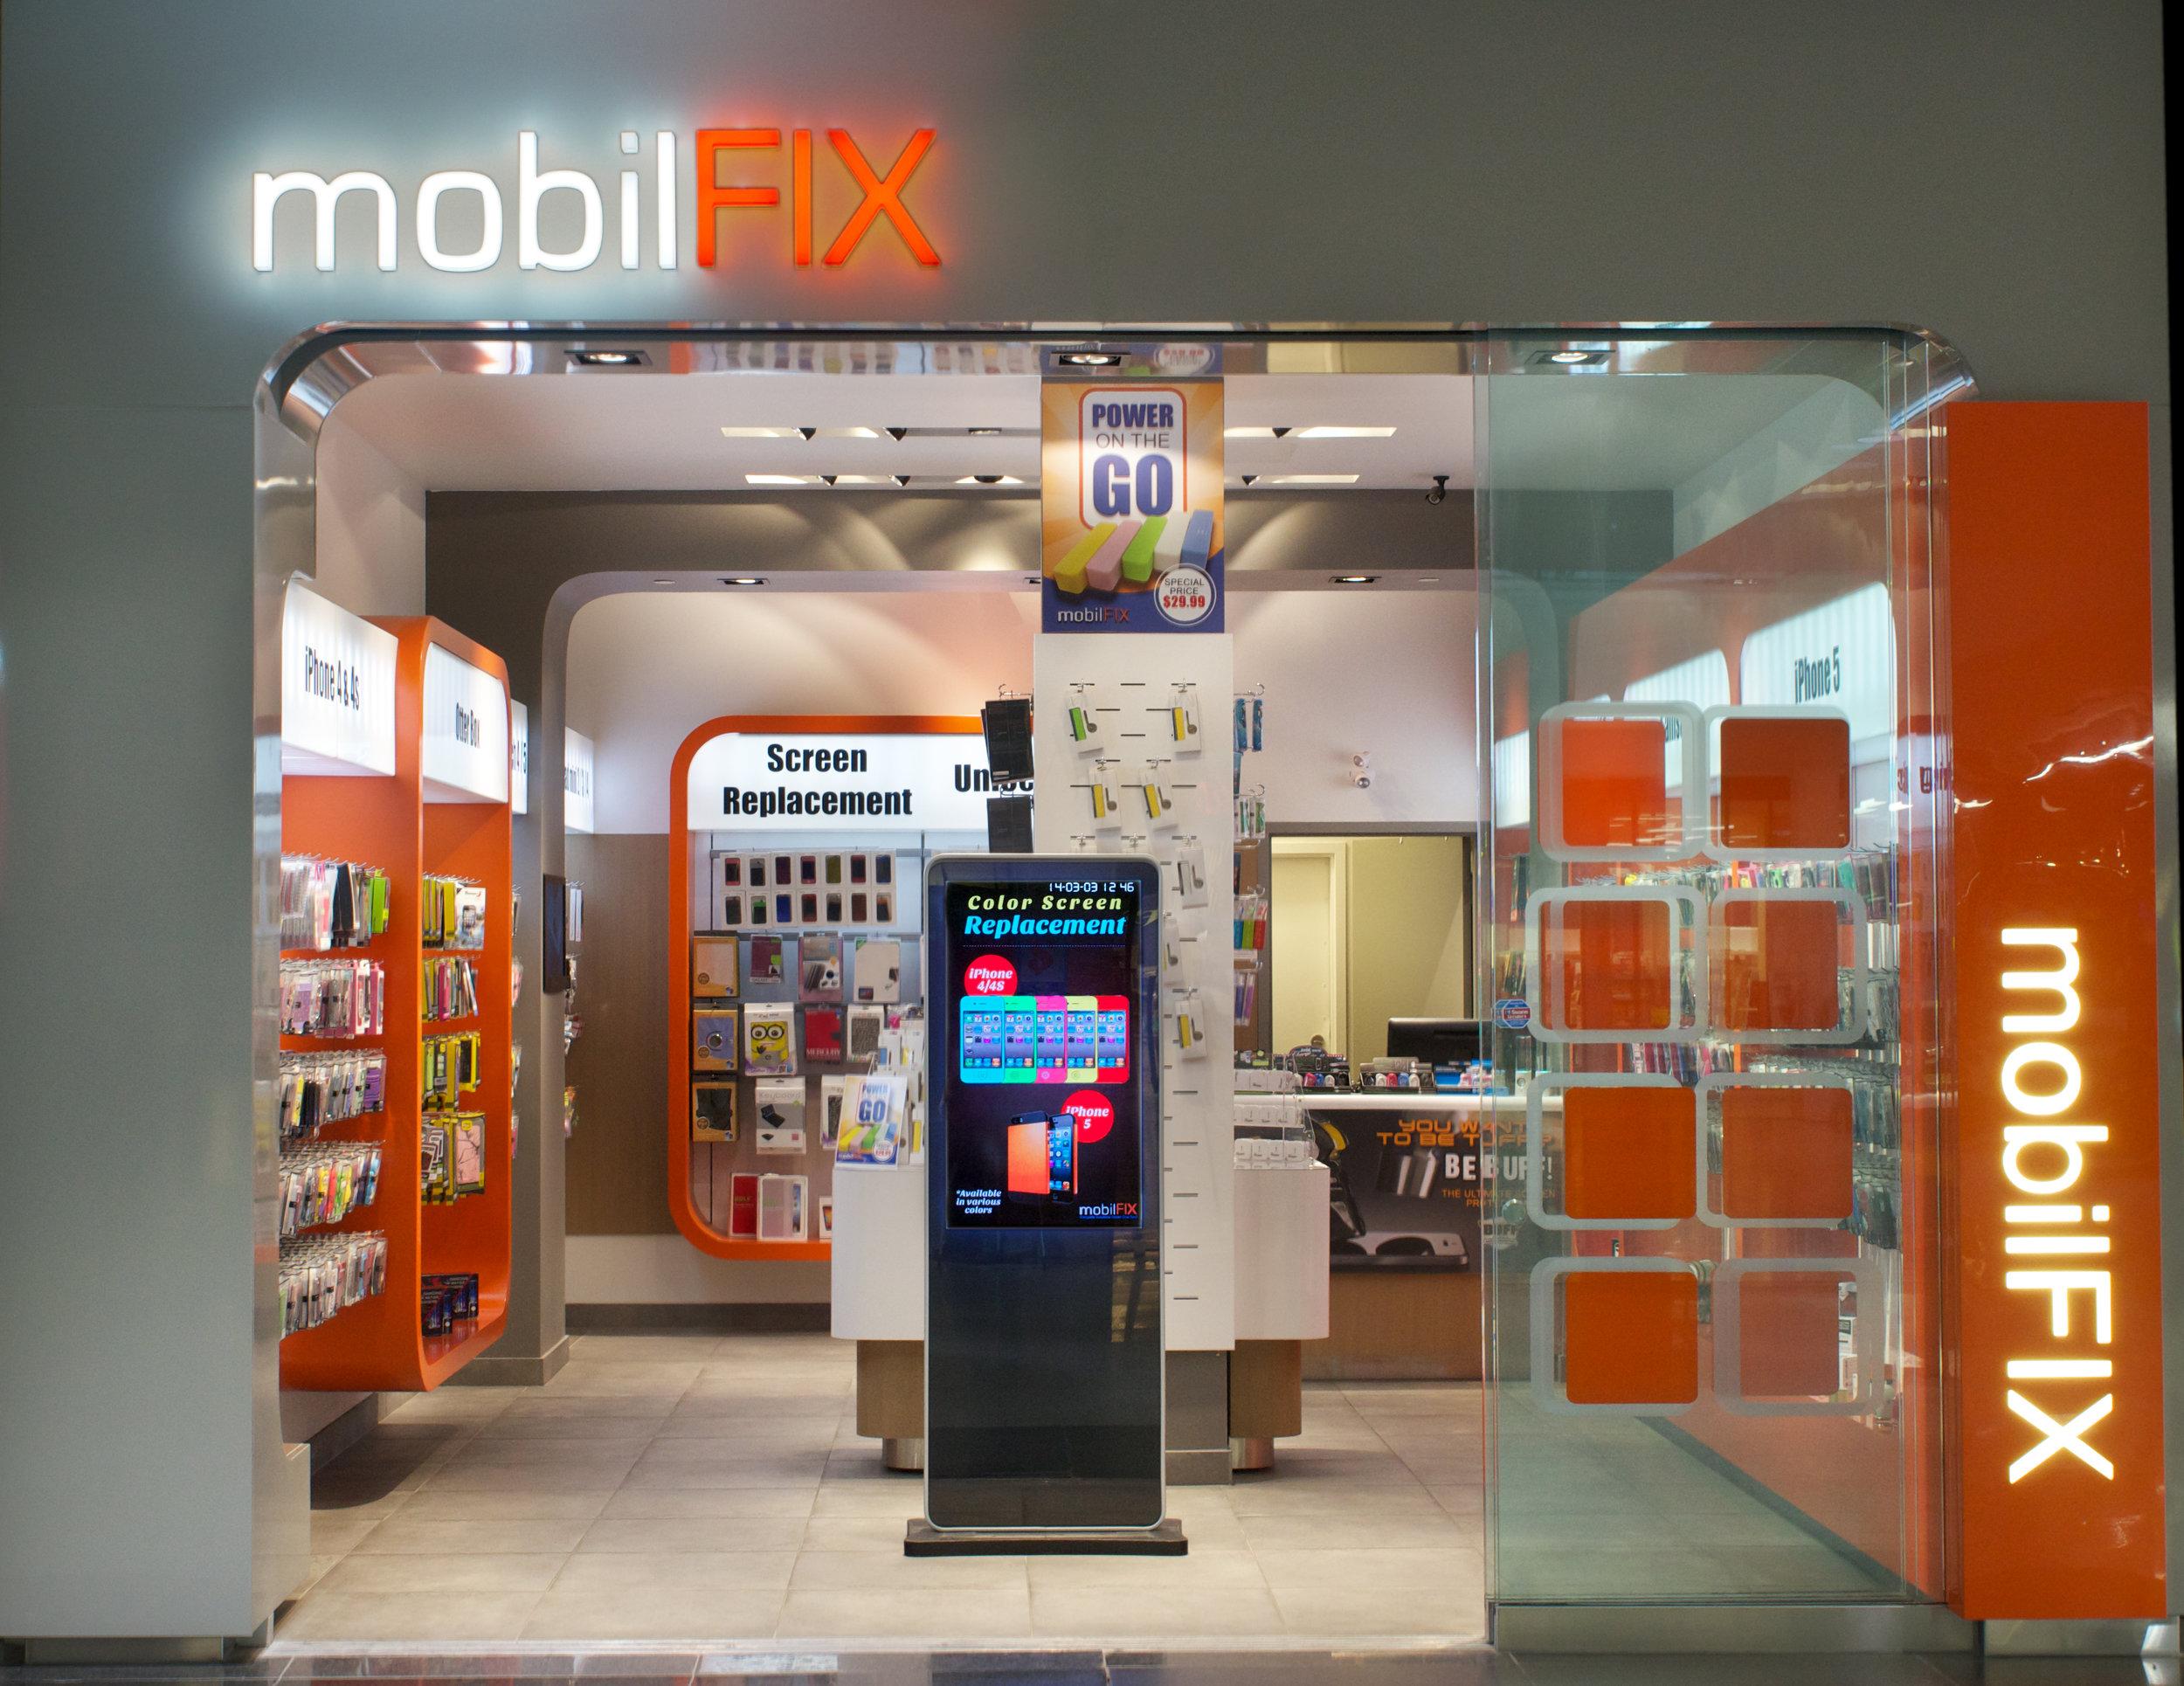 mobilFix